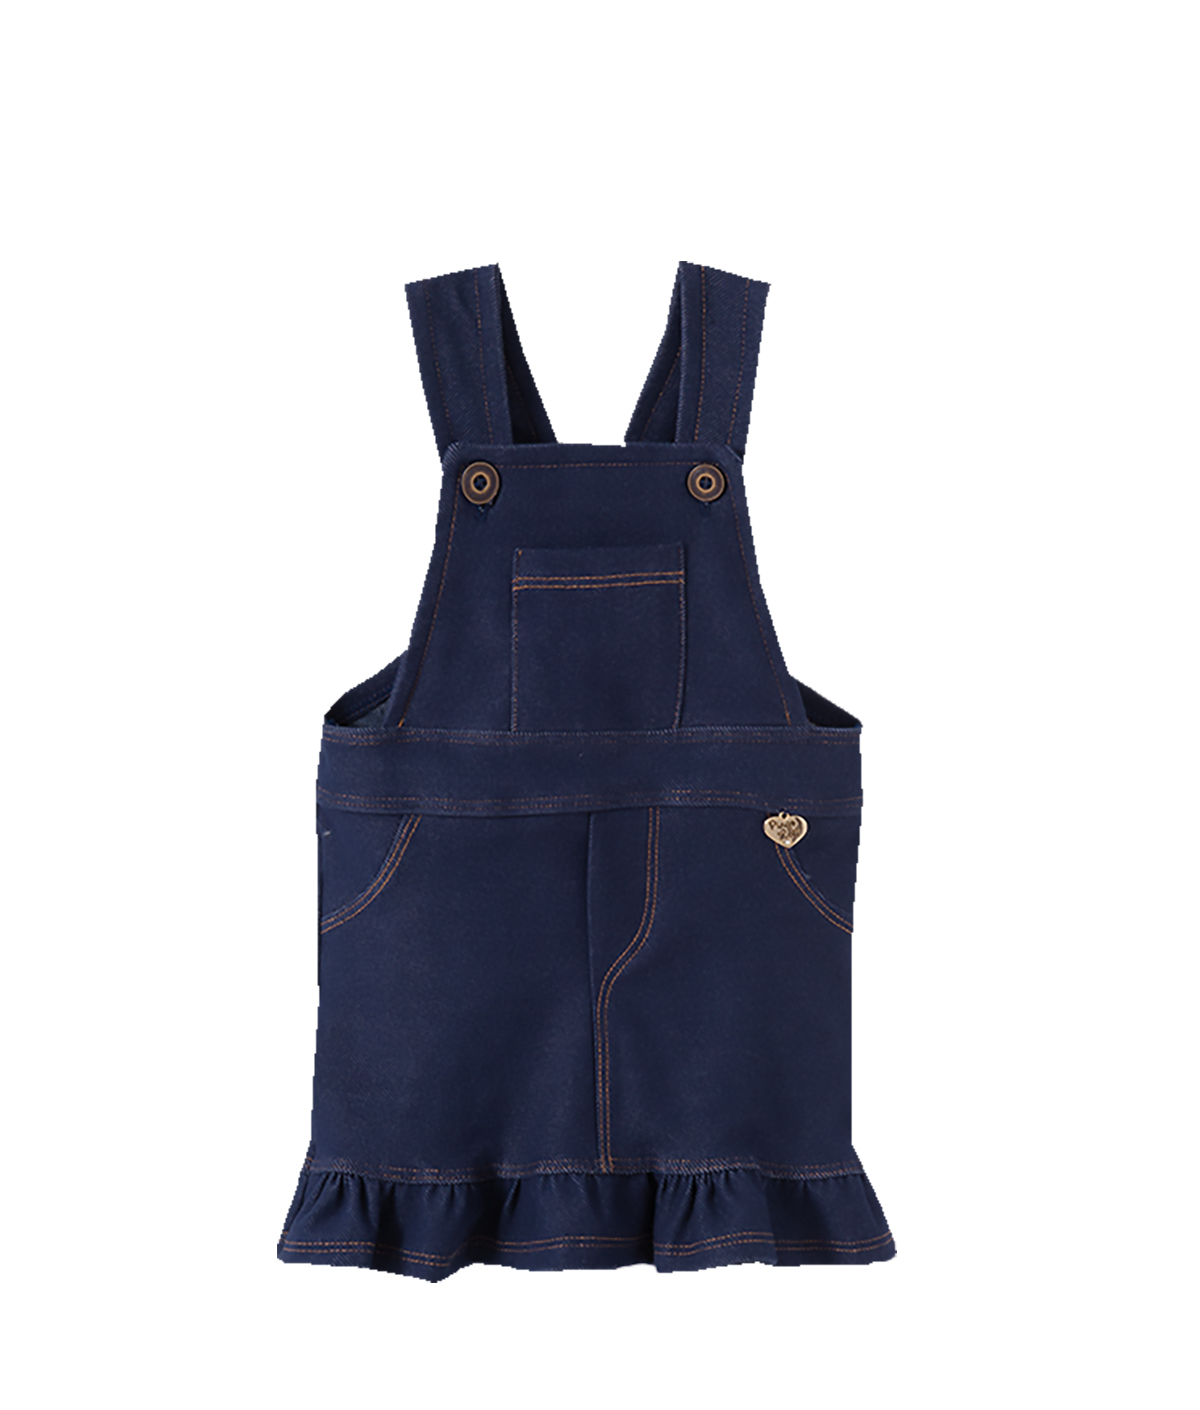 Conjunto salopete Cotton Jeans e body  manga curta Pingo Margarida Vermelho